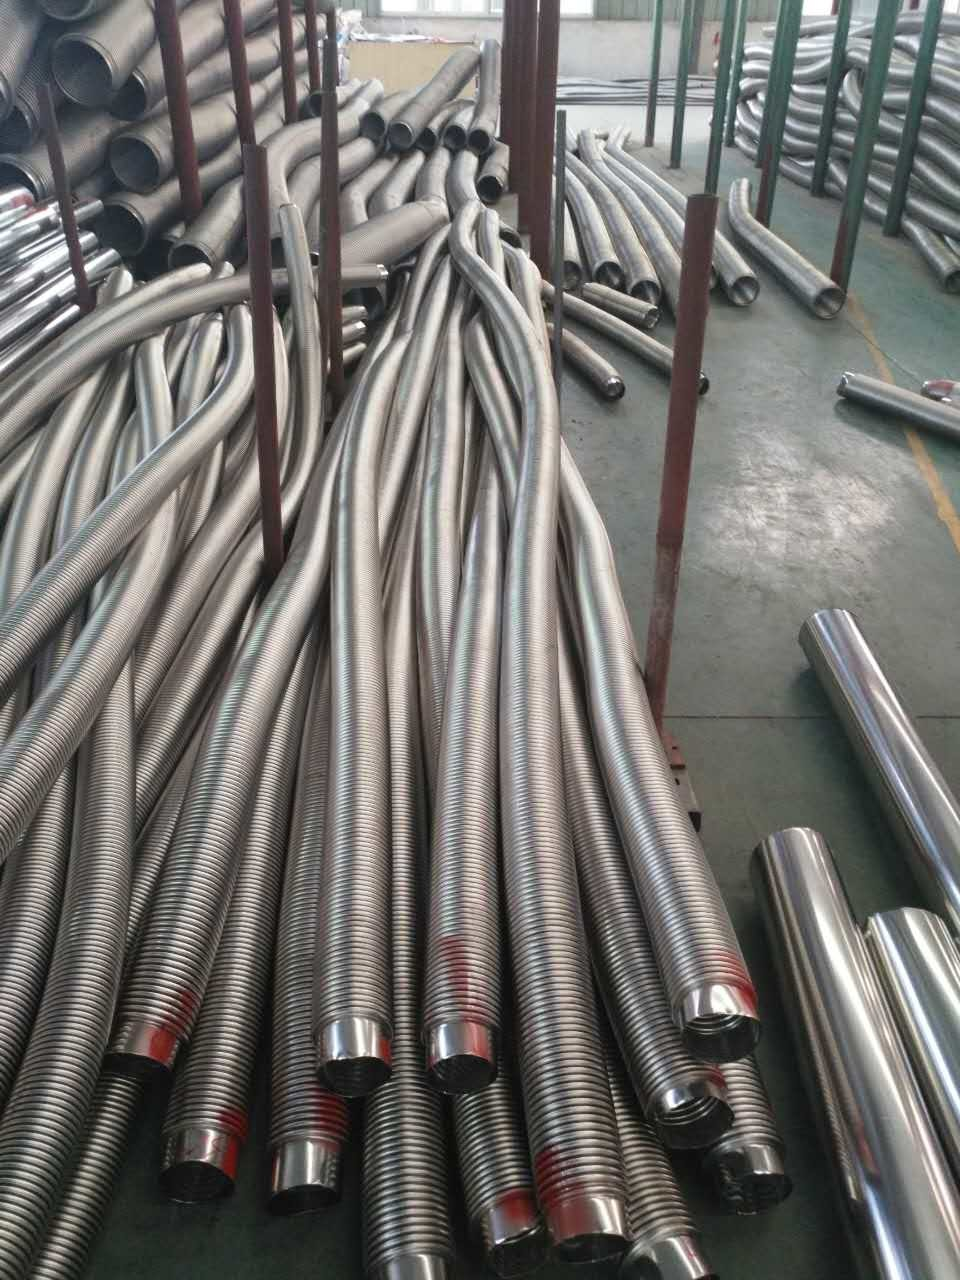 Bendable Corrugated Flexible Metal Tubing